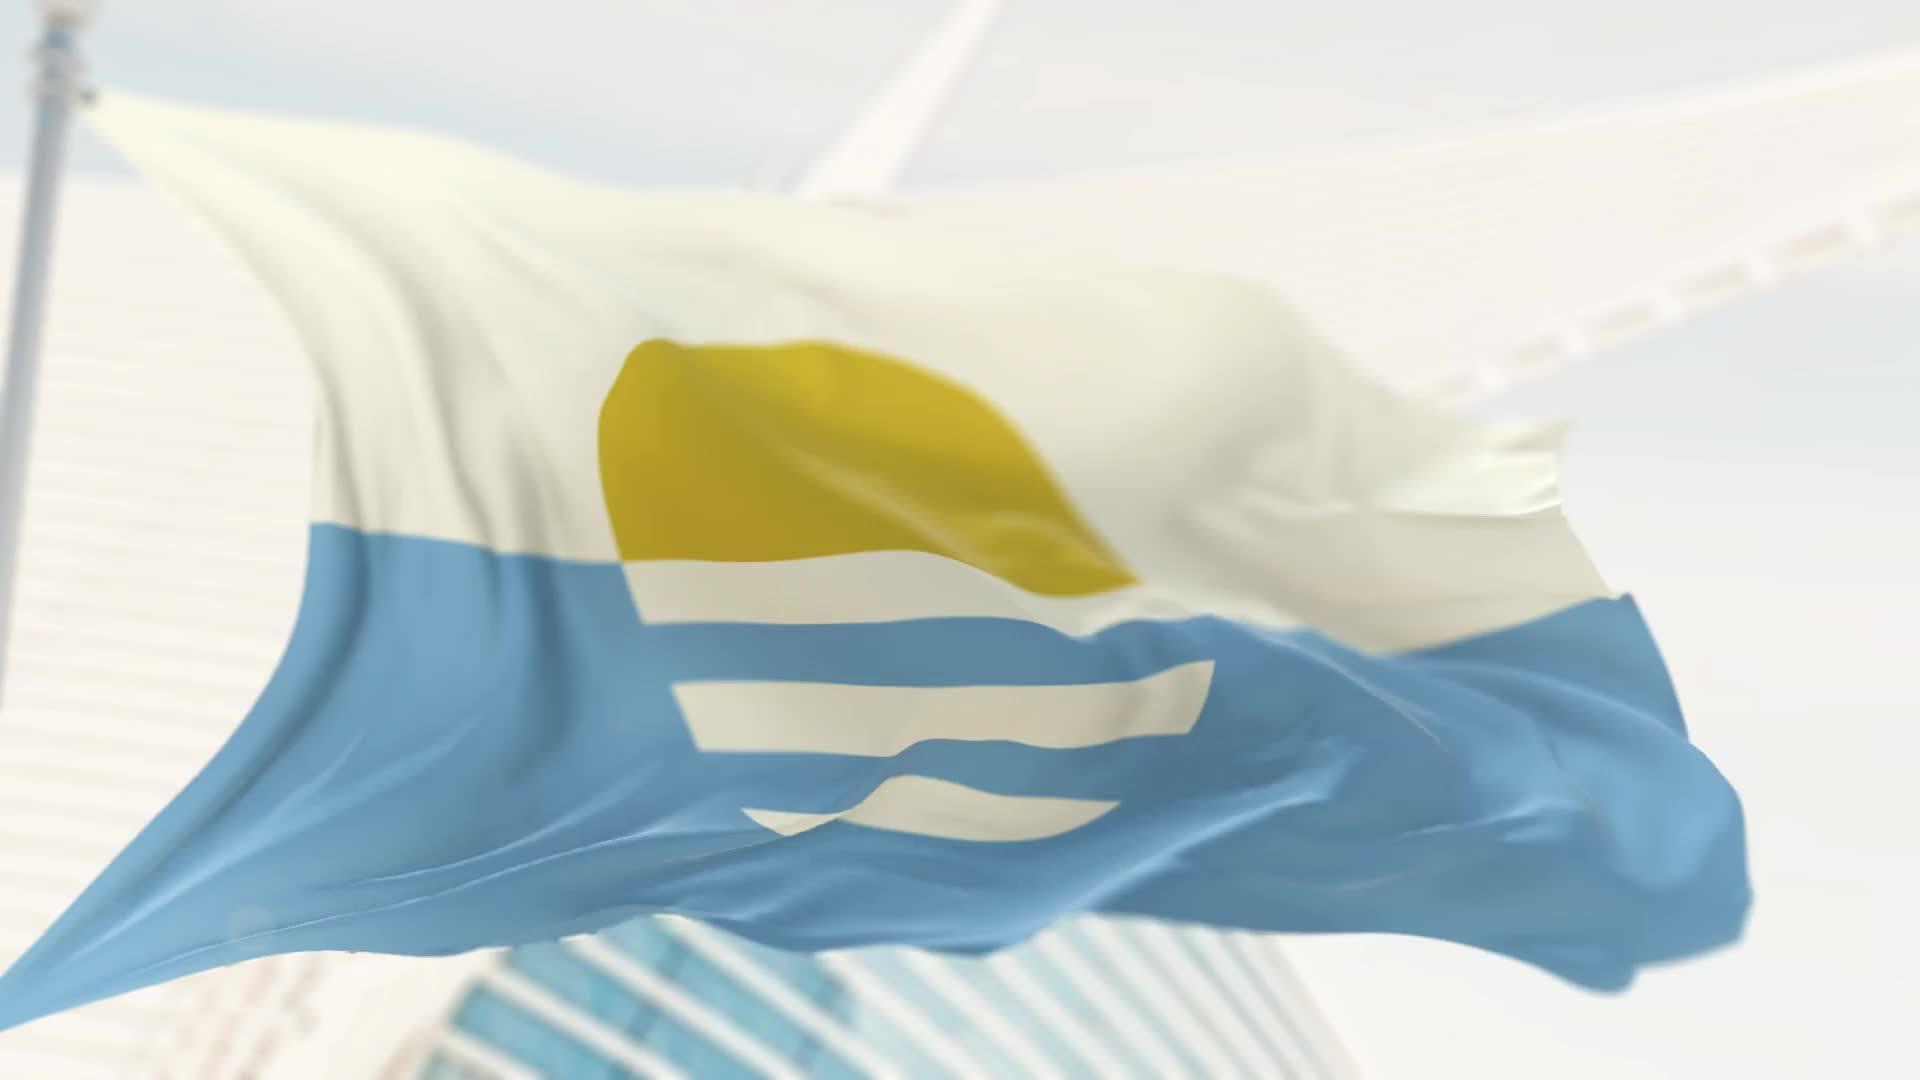 Milwaukee Flag, milwaukee, vexillology, Milwaukee Sunrise Flag - by Robert Lenz GIFs